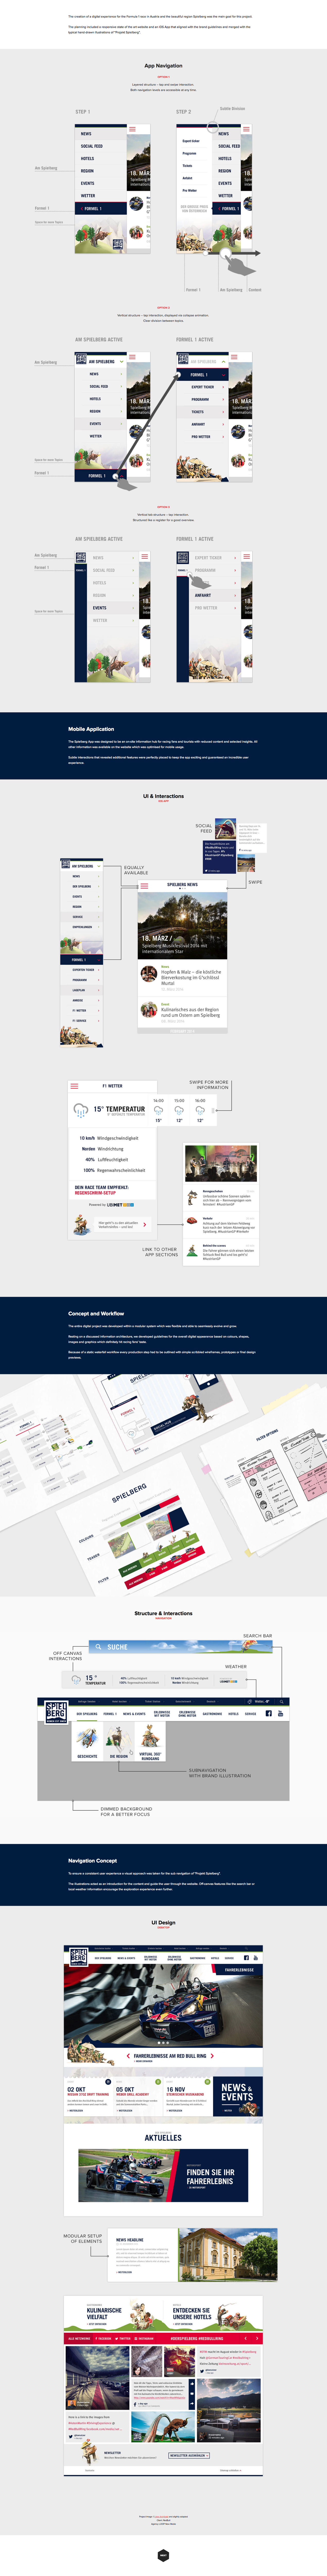 Project Page From Melanie Daveid S Portfolio Web Design Design Ux Design